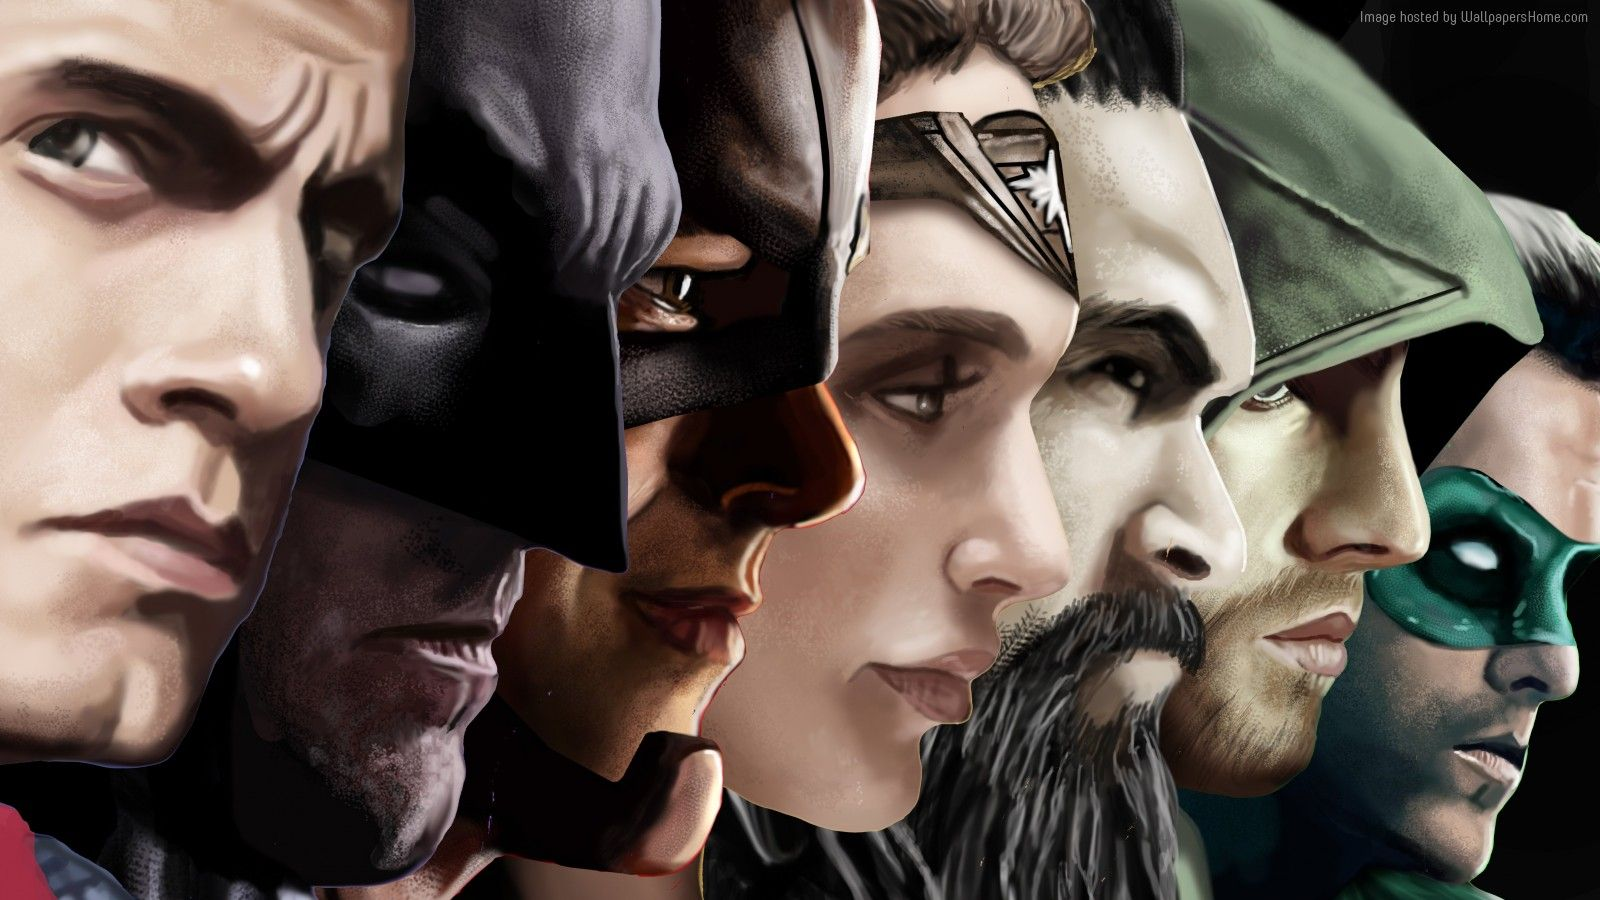 justice league movie images